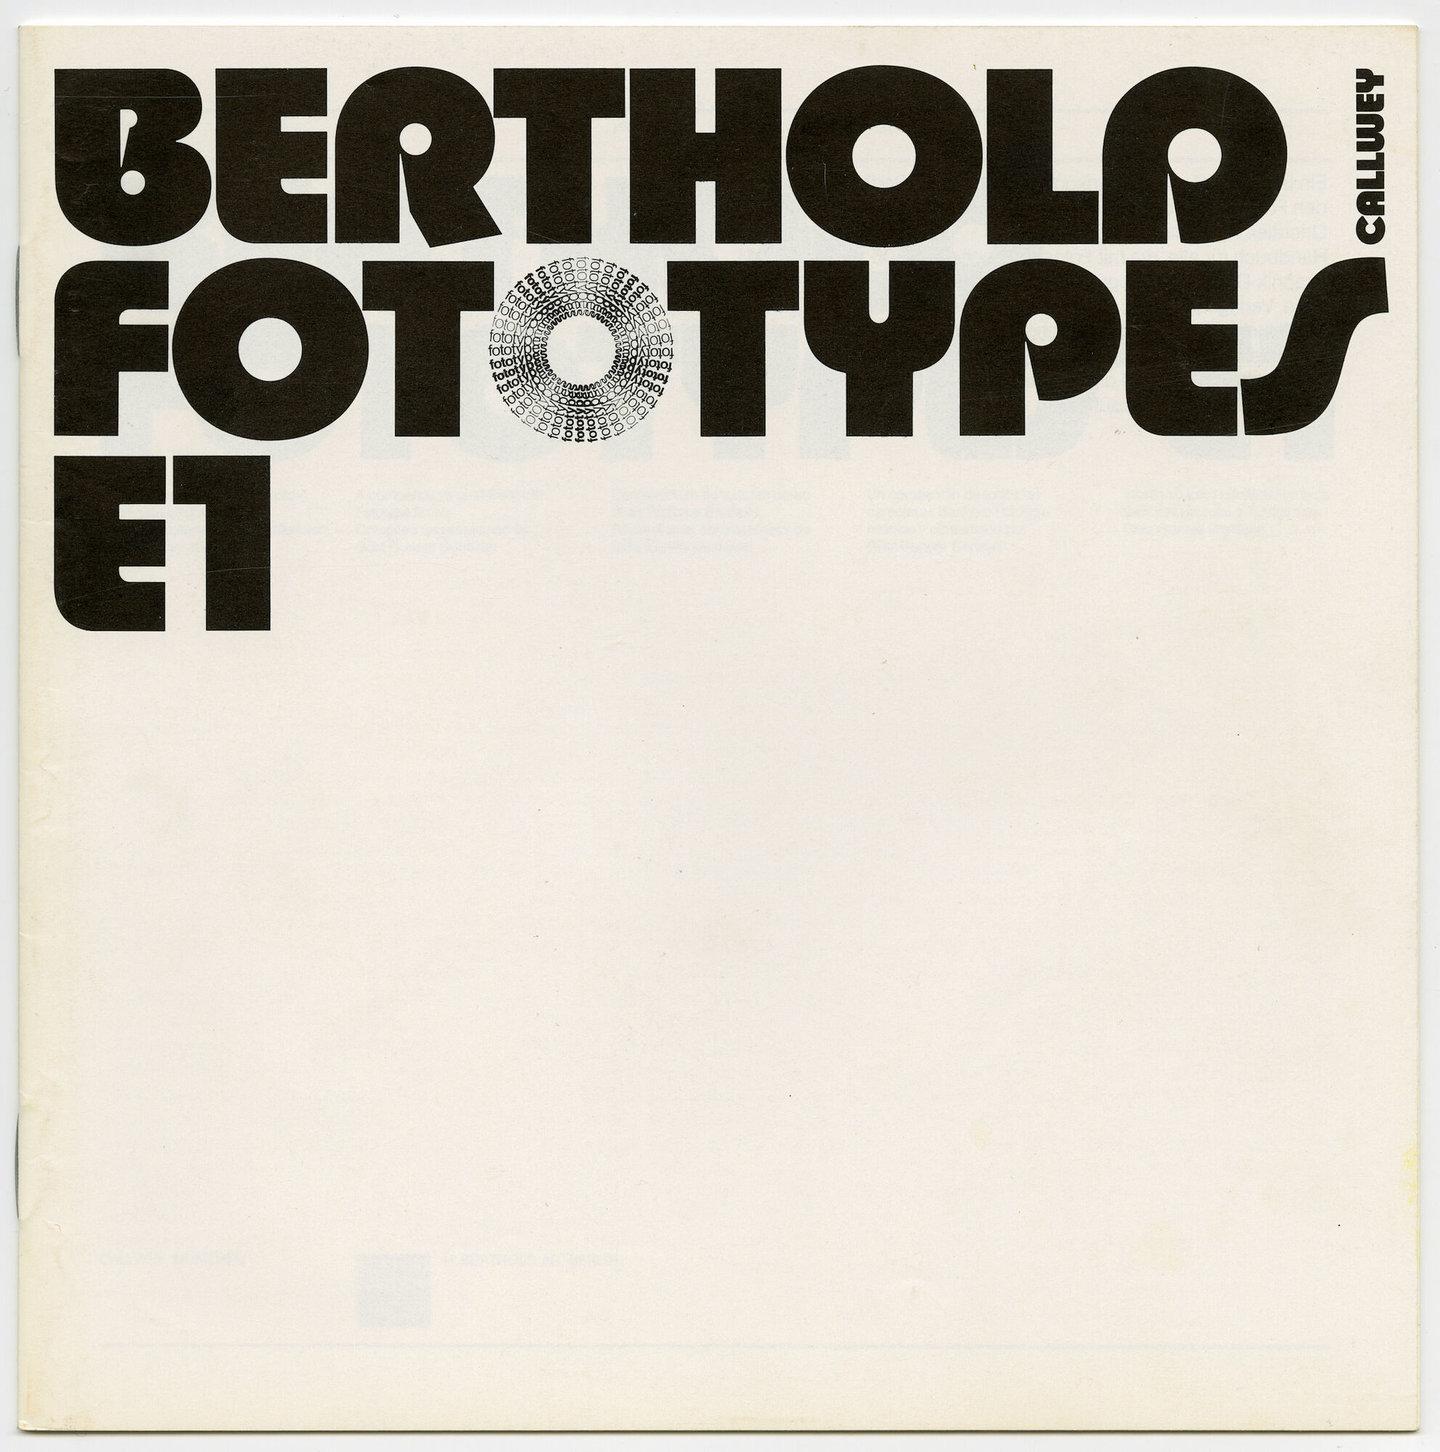 Letterproef met lettertypes voor Berthold Fototypes E1